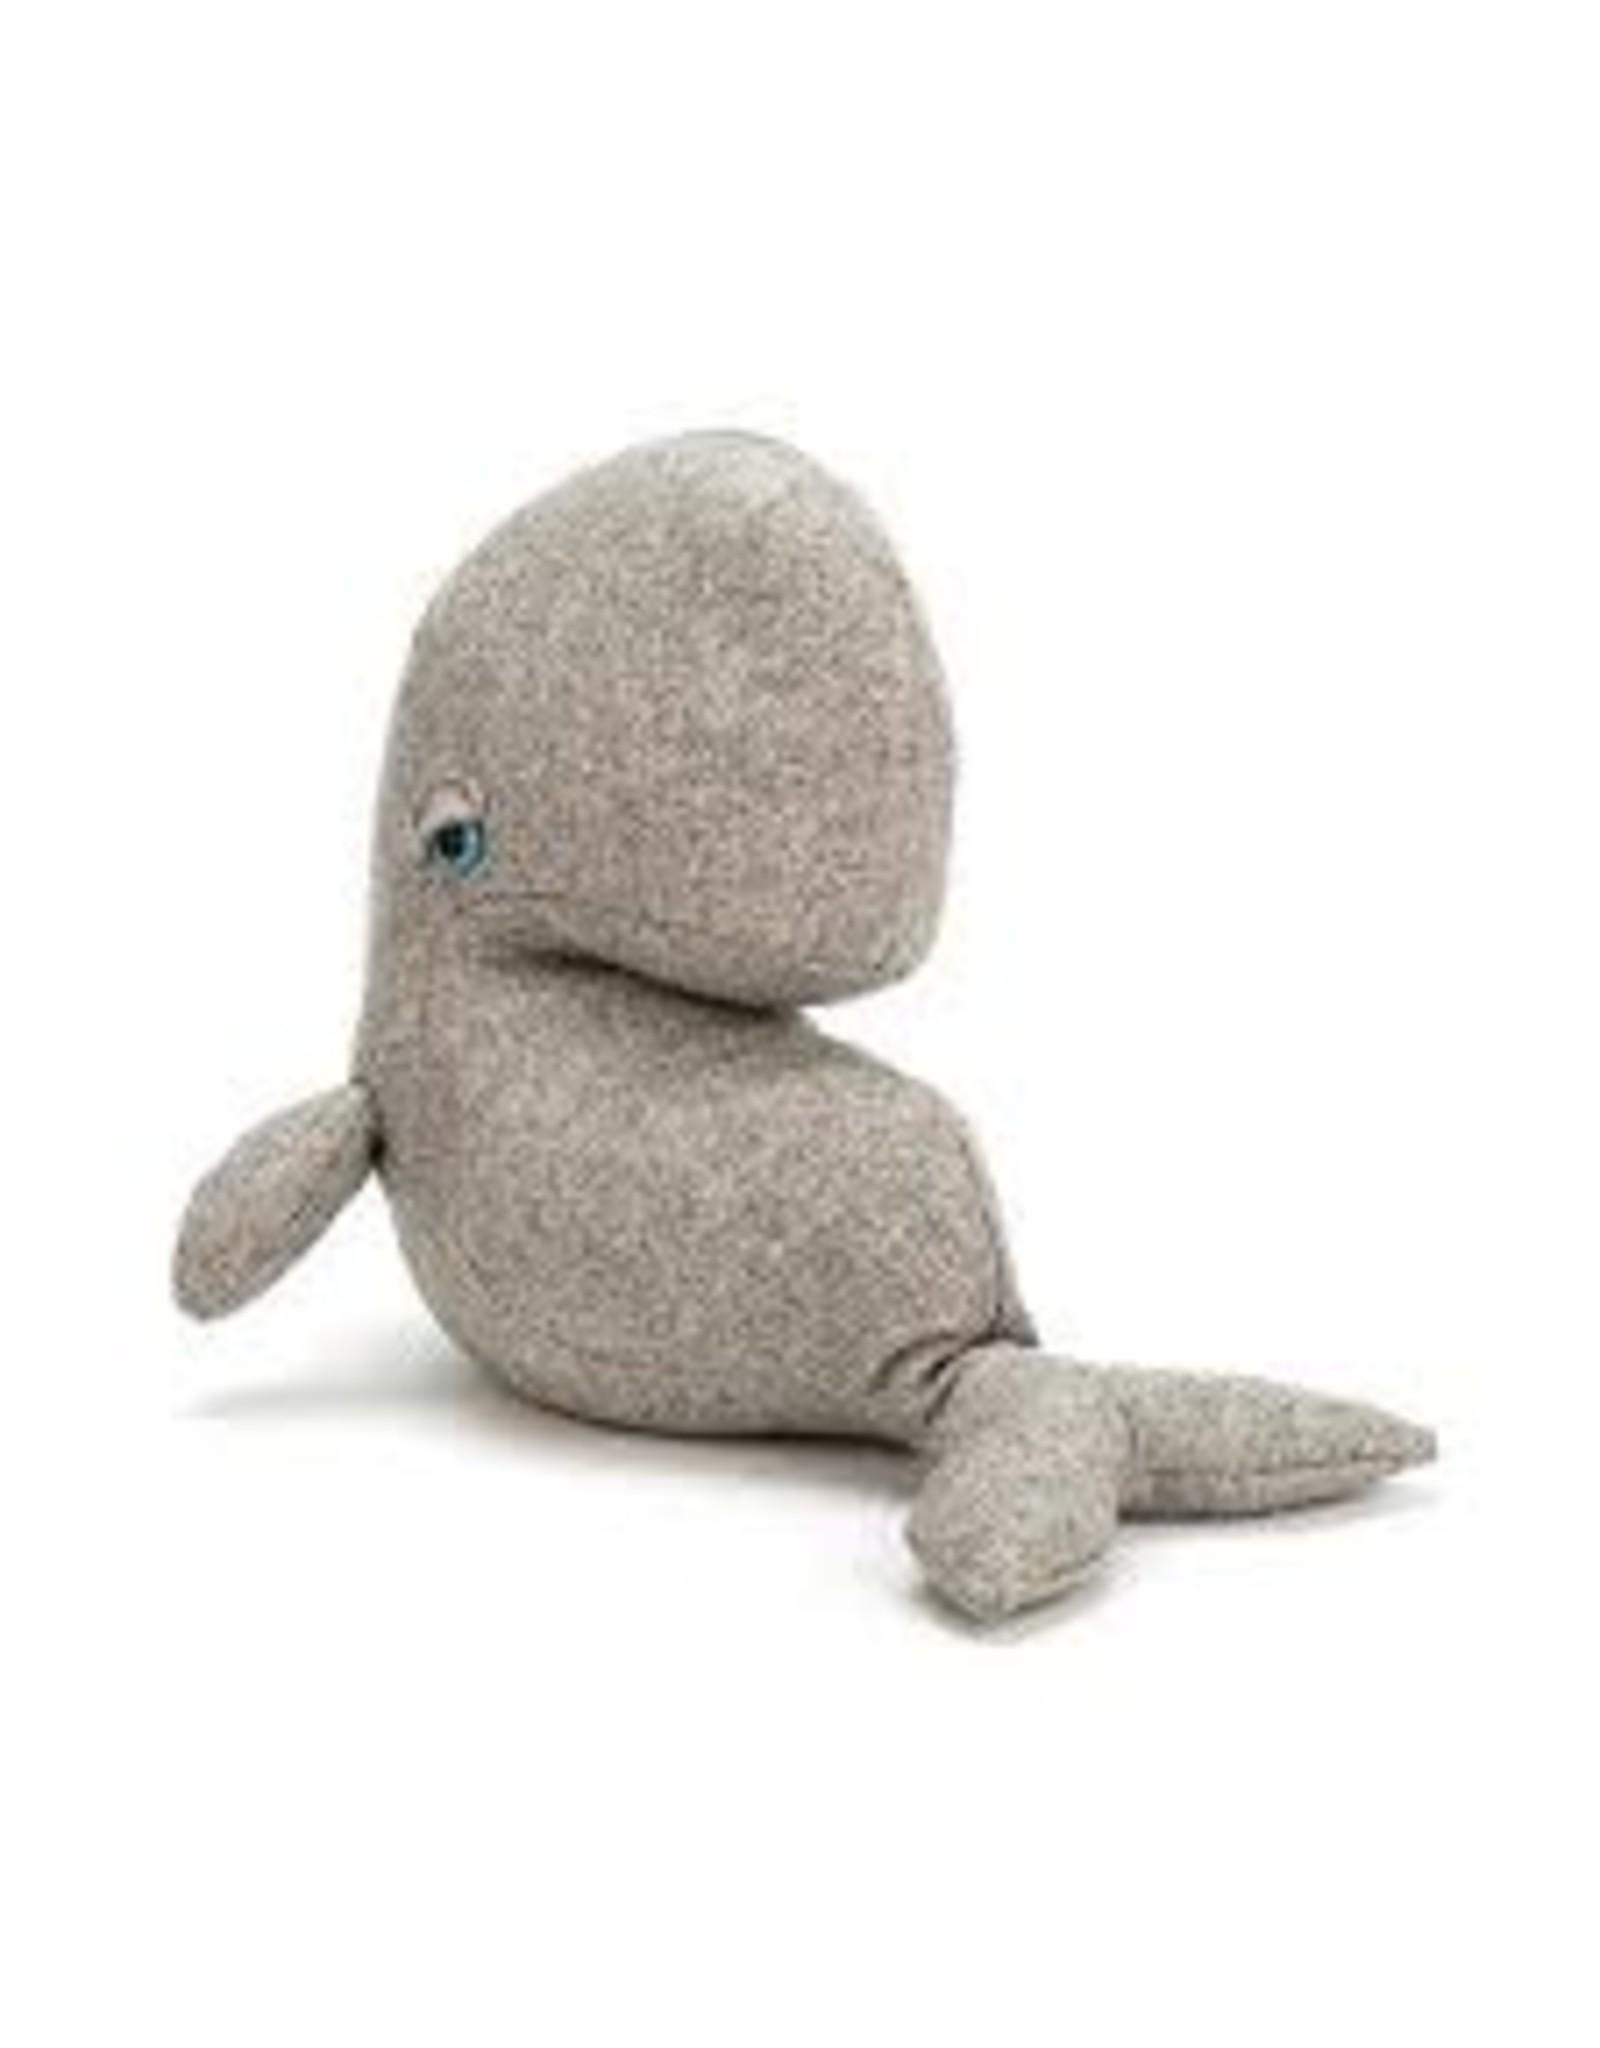 Jellycat Pobblewob Whale